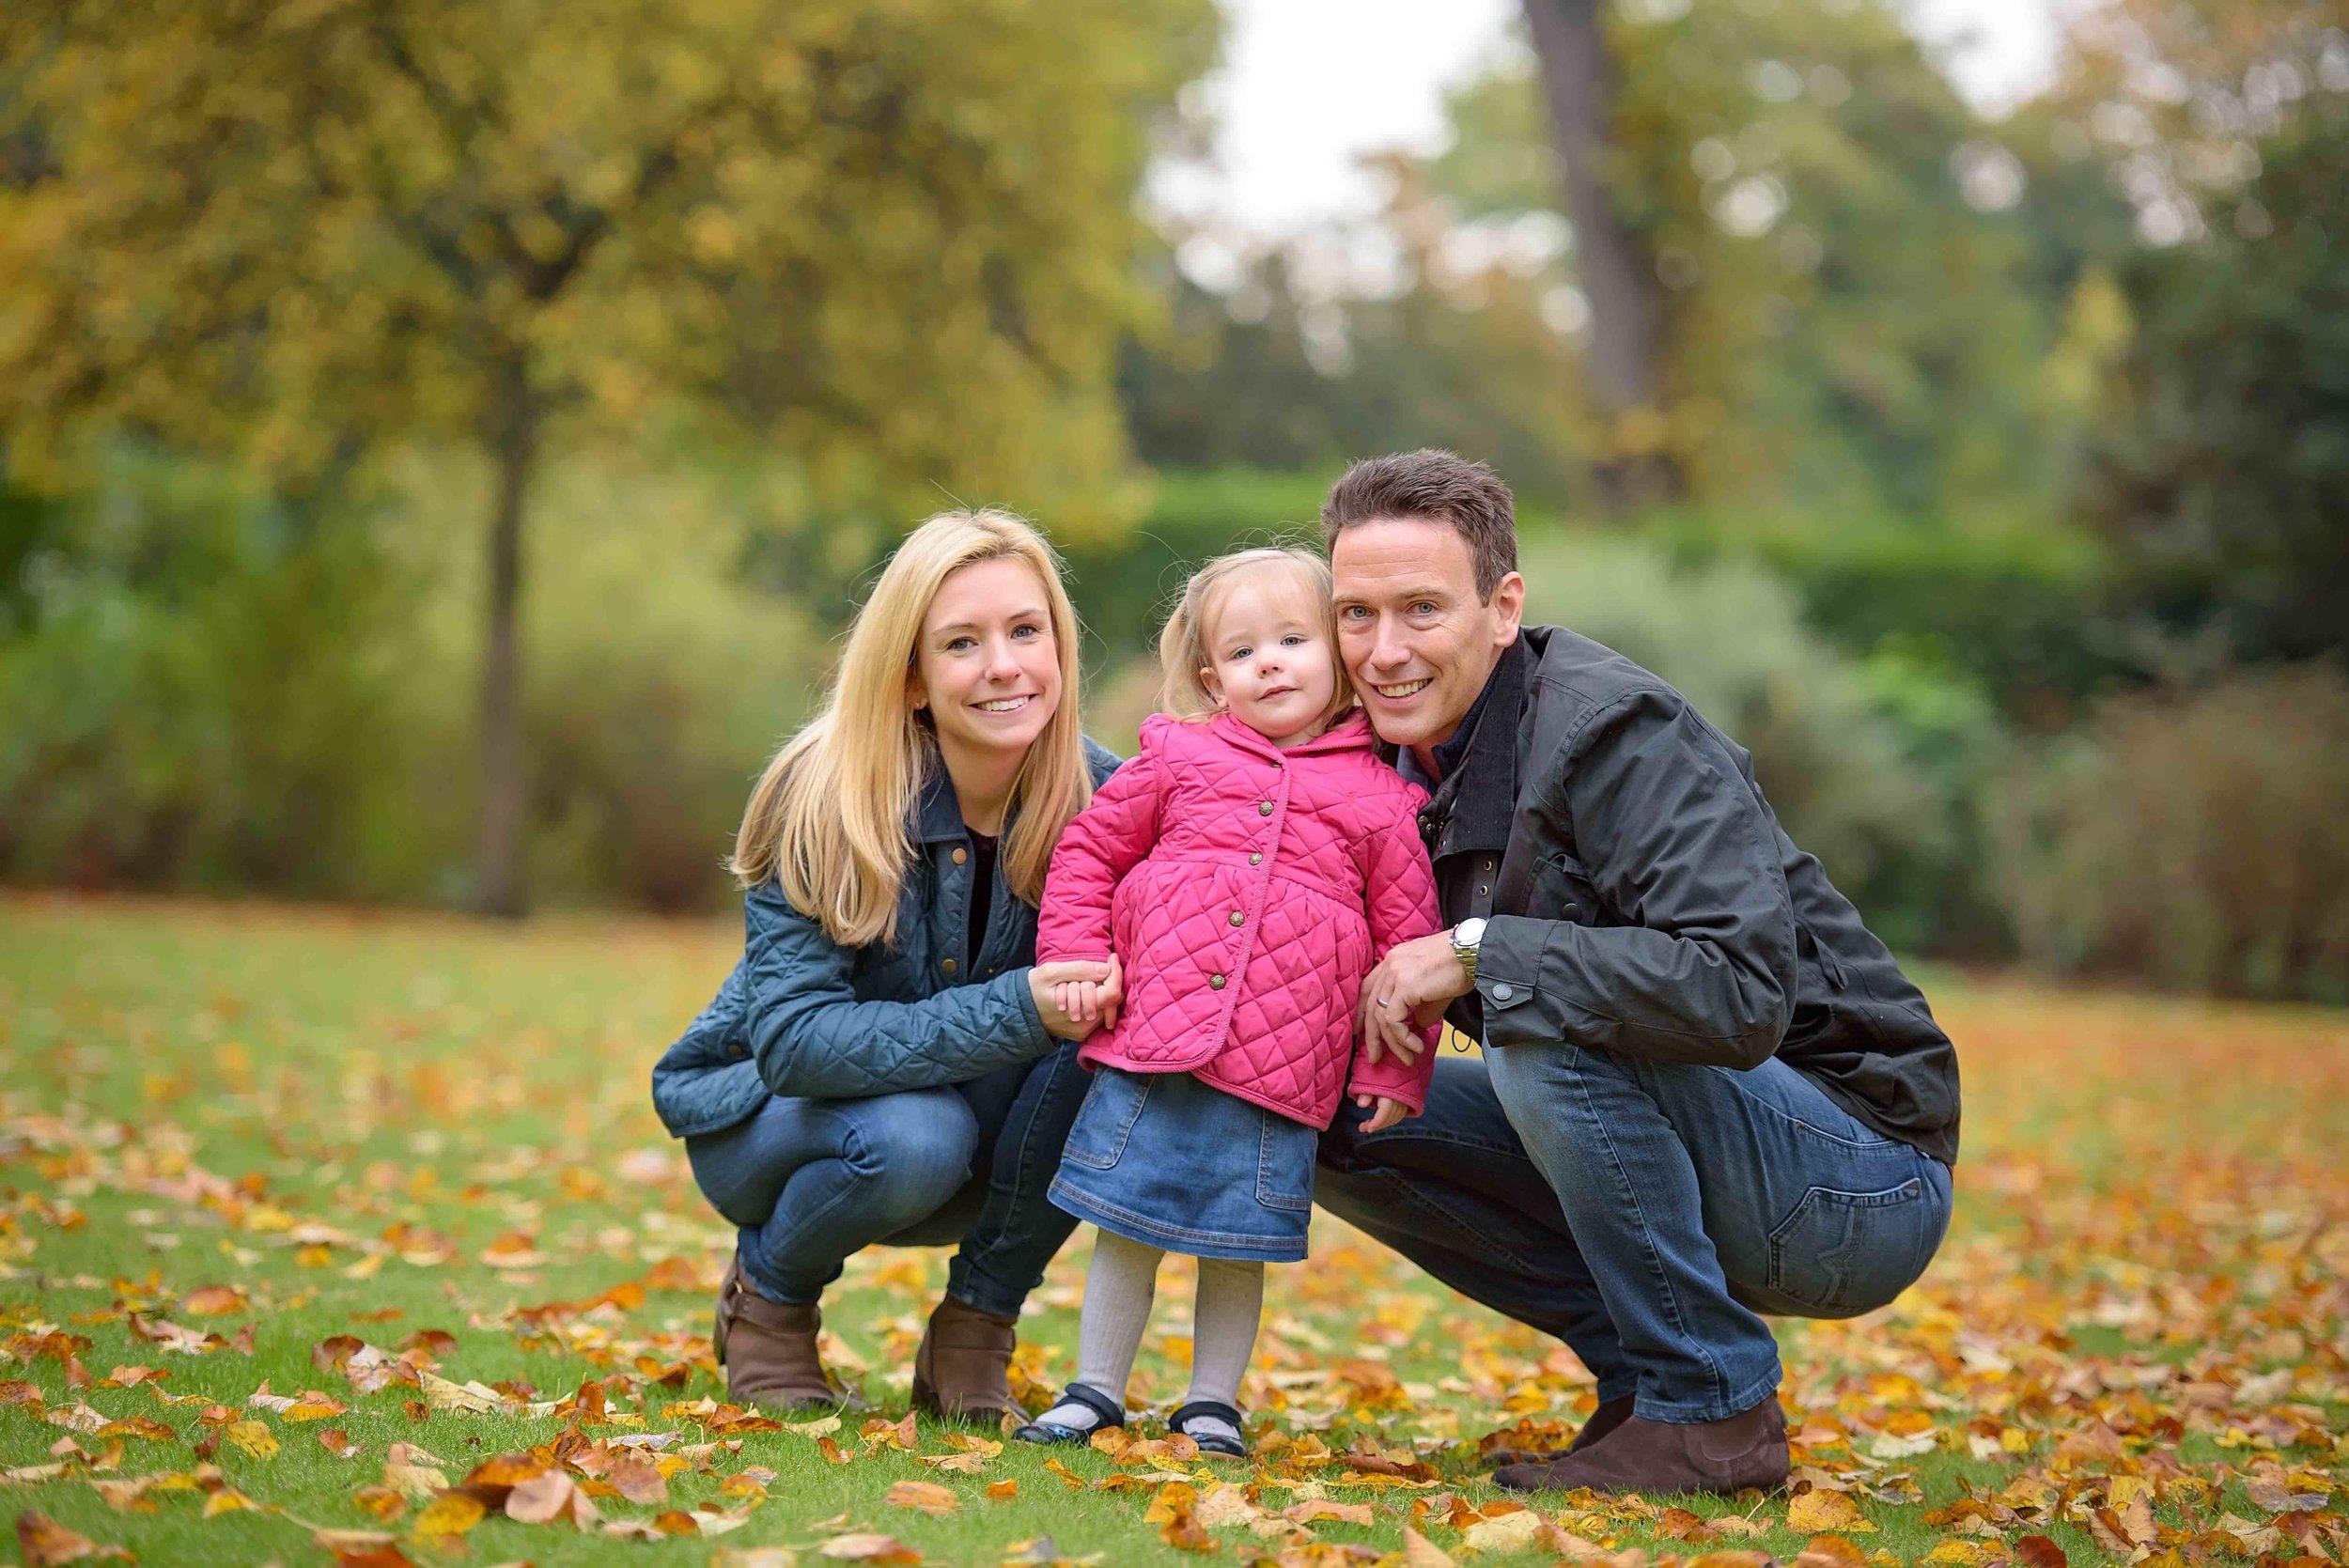 Kensington family photographers